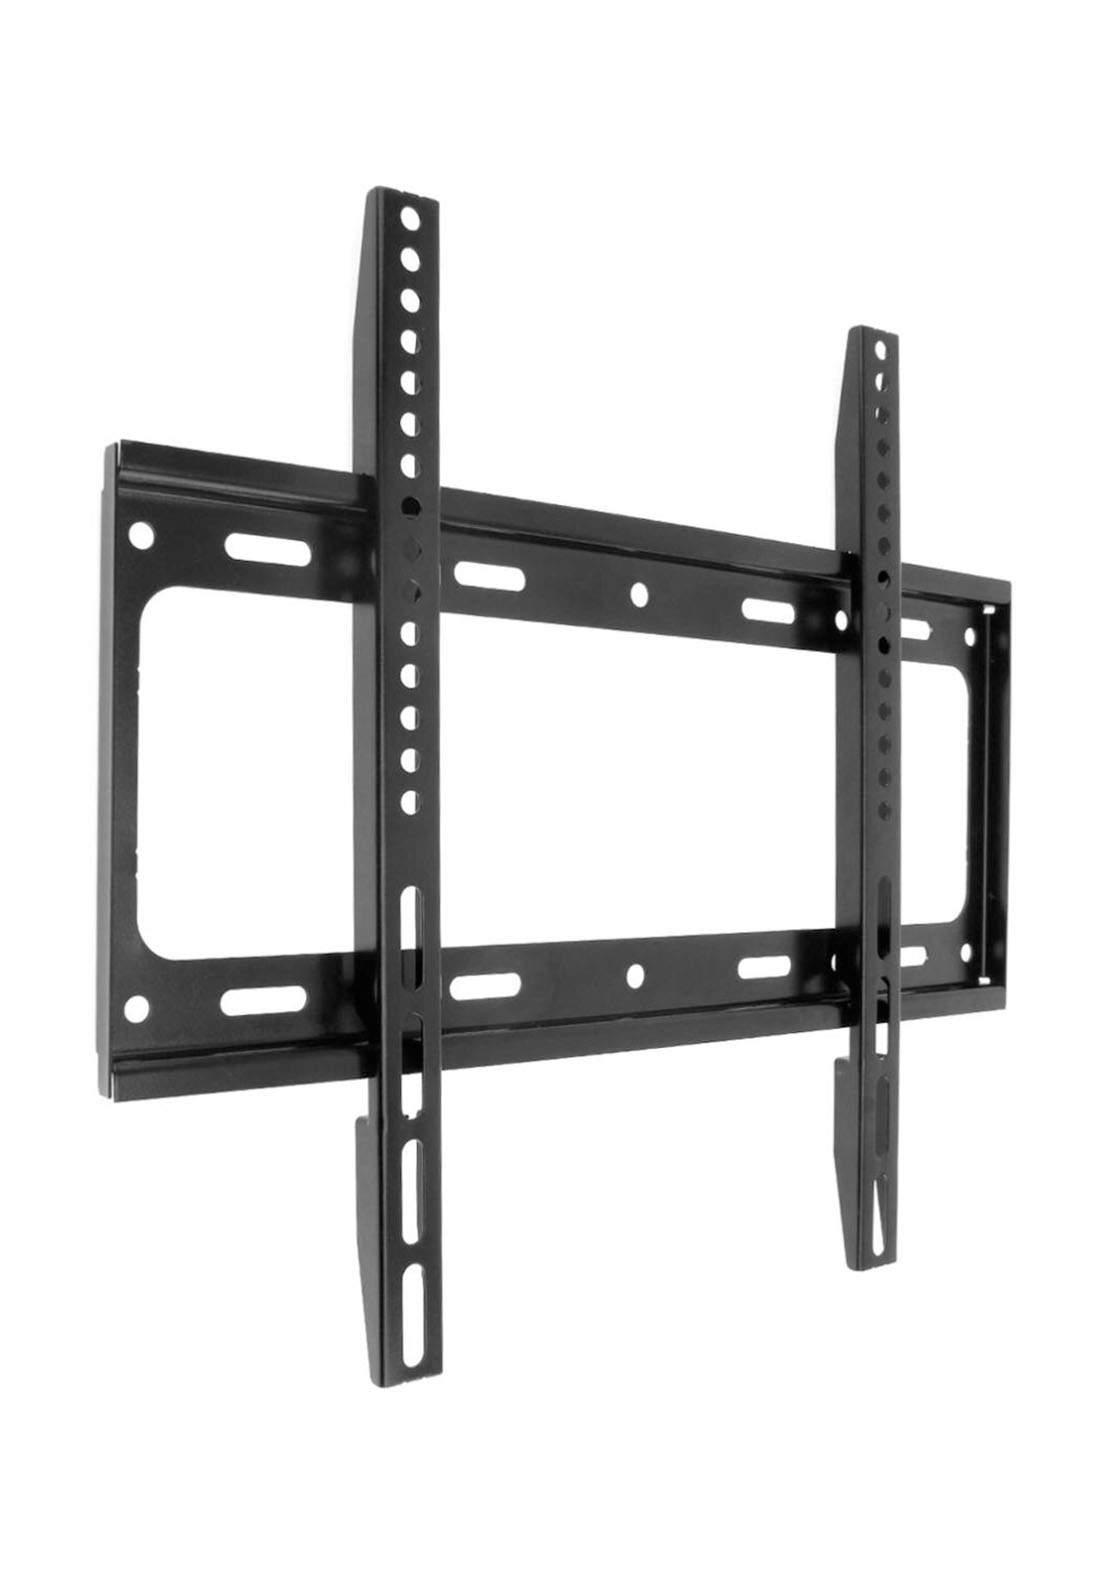 PHILIPS LCD/LED/PLASMA TV WALL MOUNT for 26 -55 ستاند شاشة